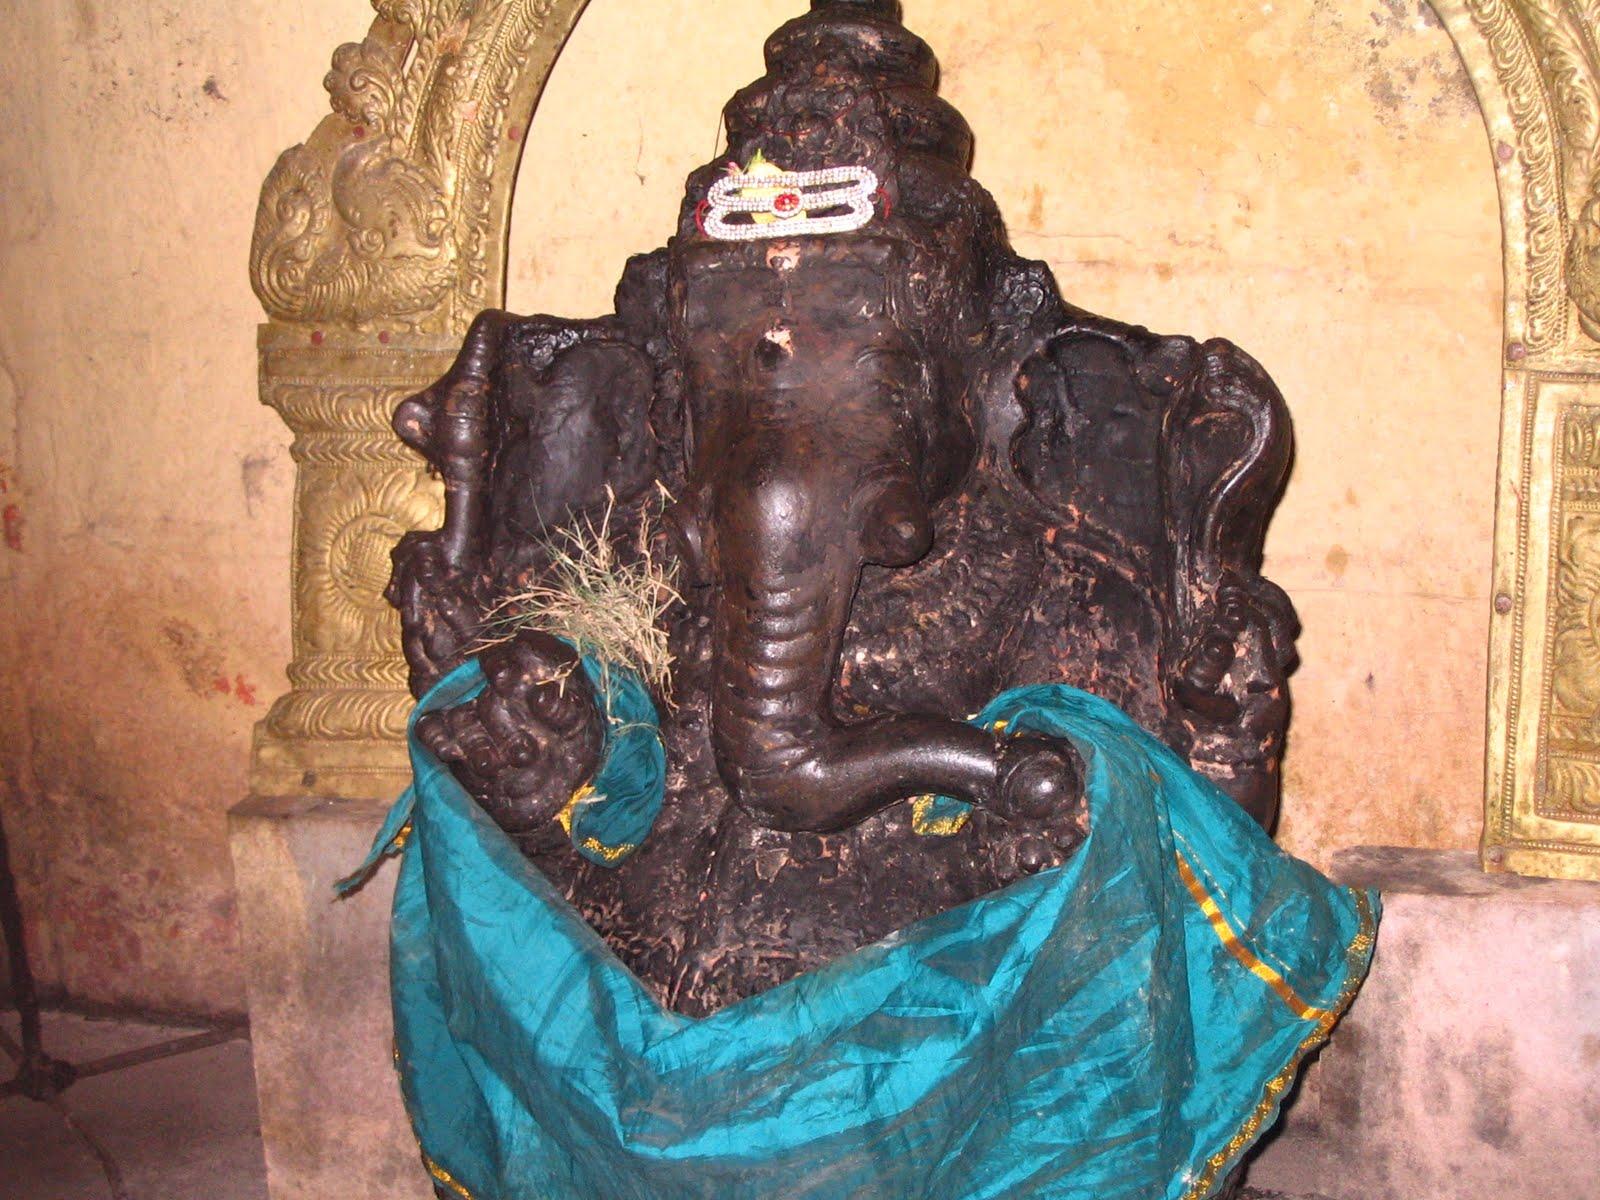 Thiruvaiyaru Abhistavaradha Ganapathi Temple